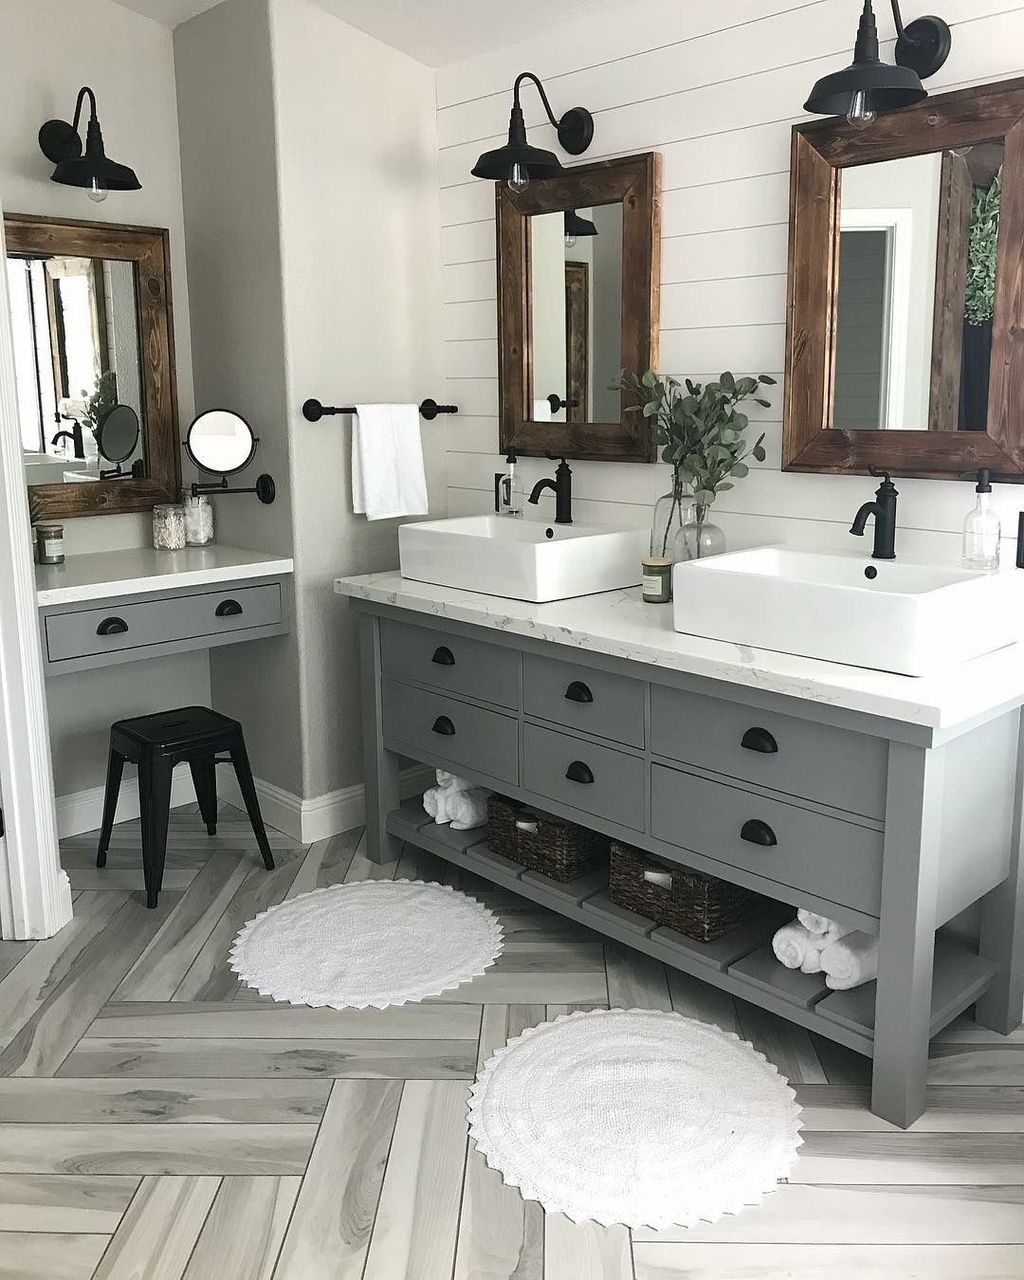 48 simple master bathroom renovation ideas bathroom bathroom rh pinterest com